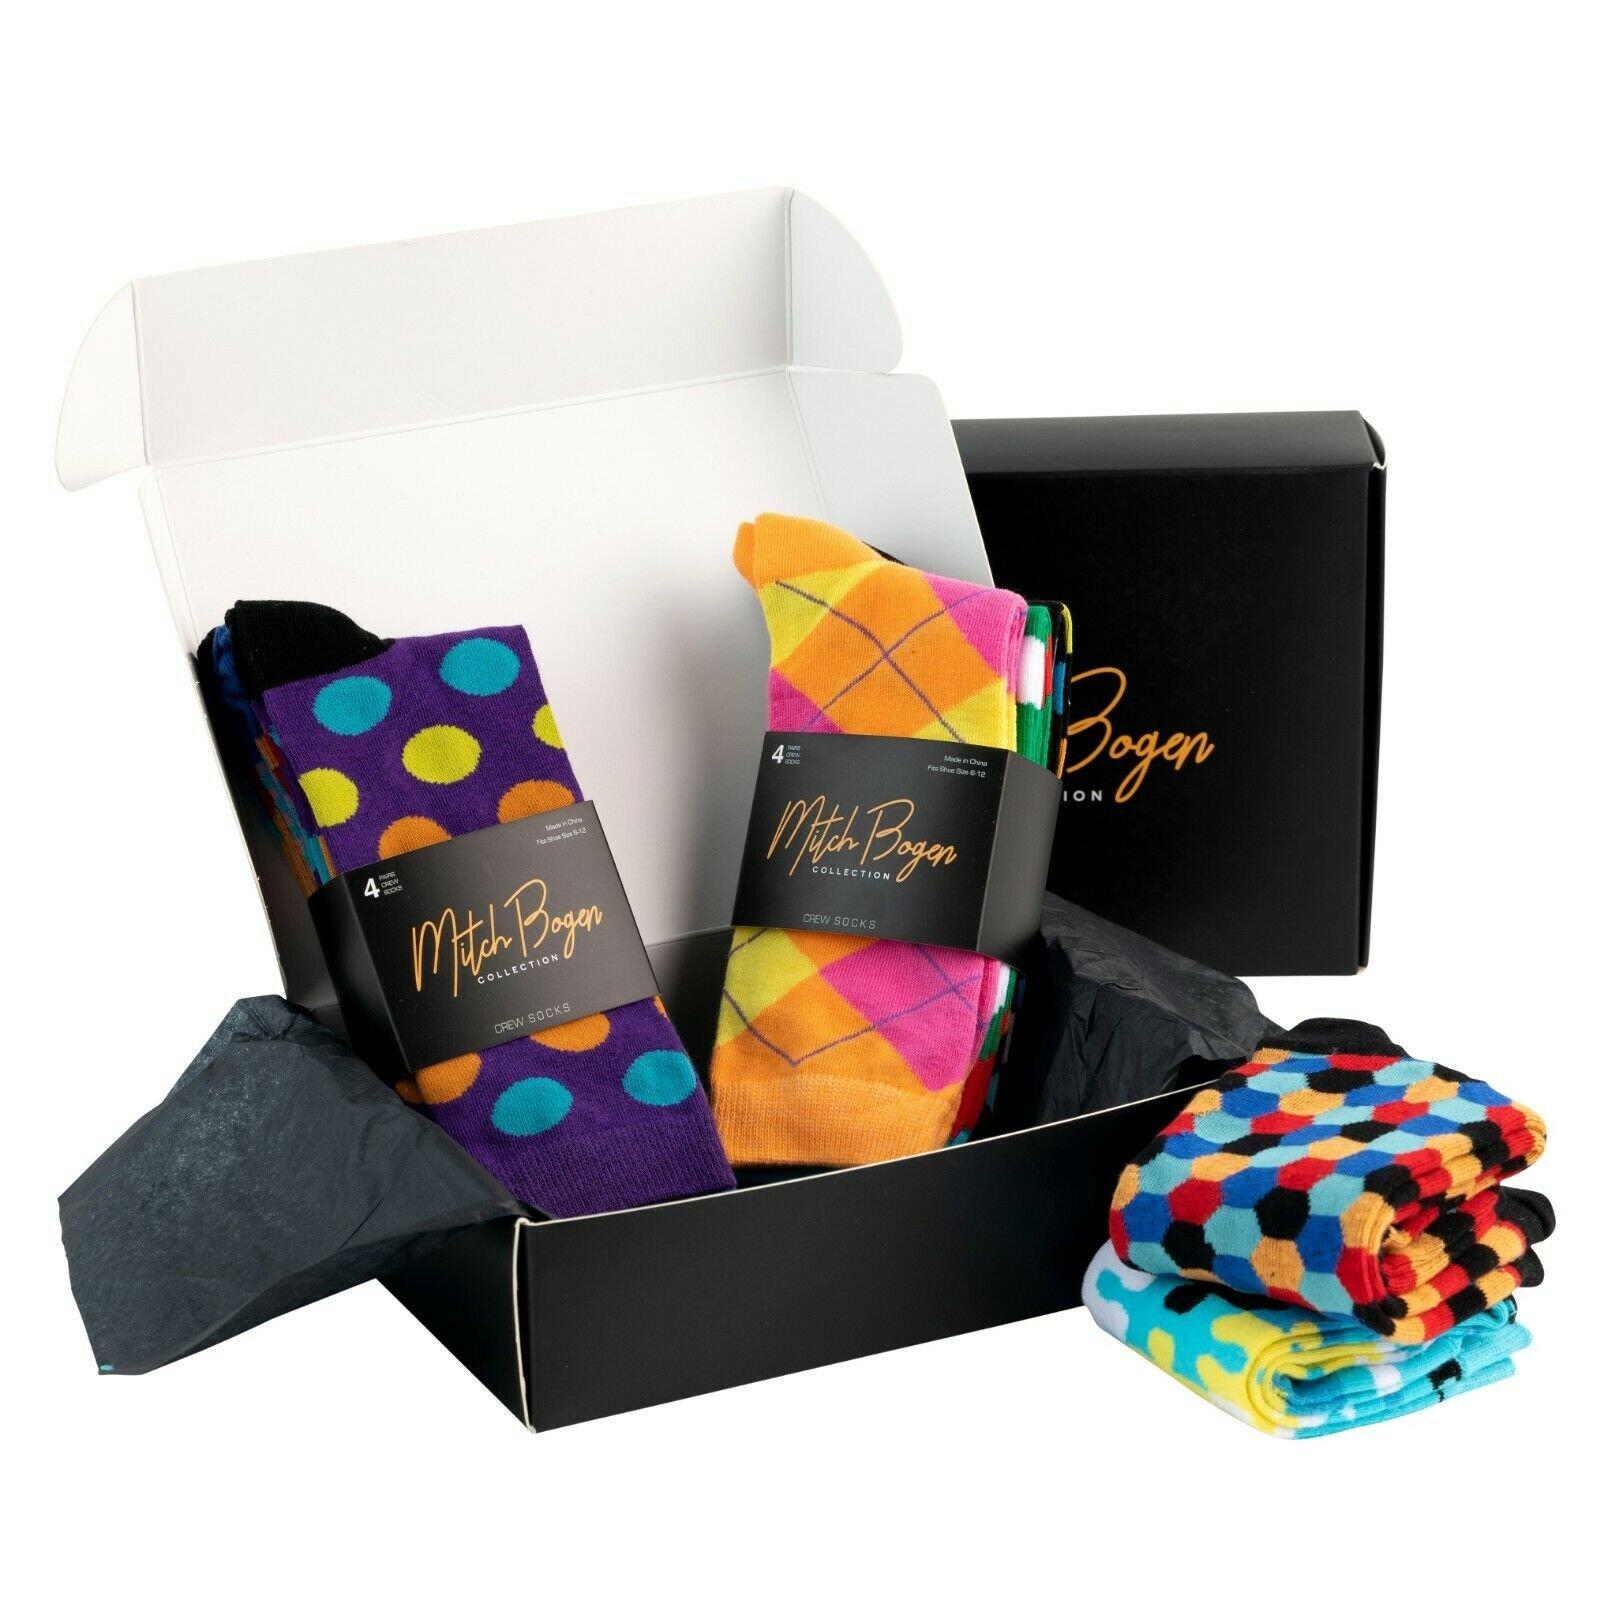 Mitch-Bogen-Mens-Cotton-Dress-Socks-Colorful-Fashion-Crew-Socks-8-Pack-Gift-Box thumbnail 8